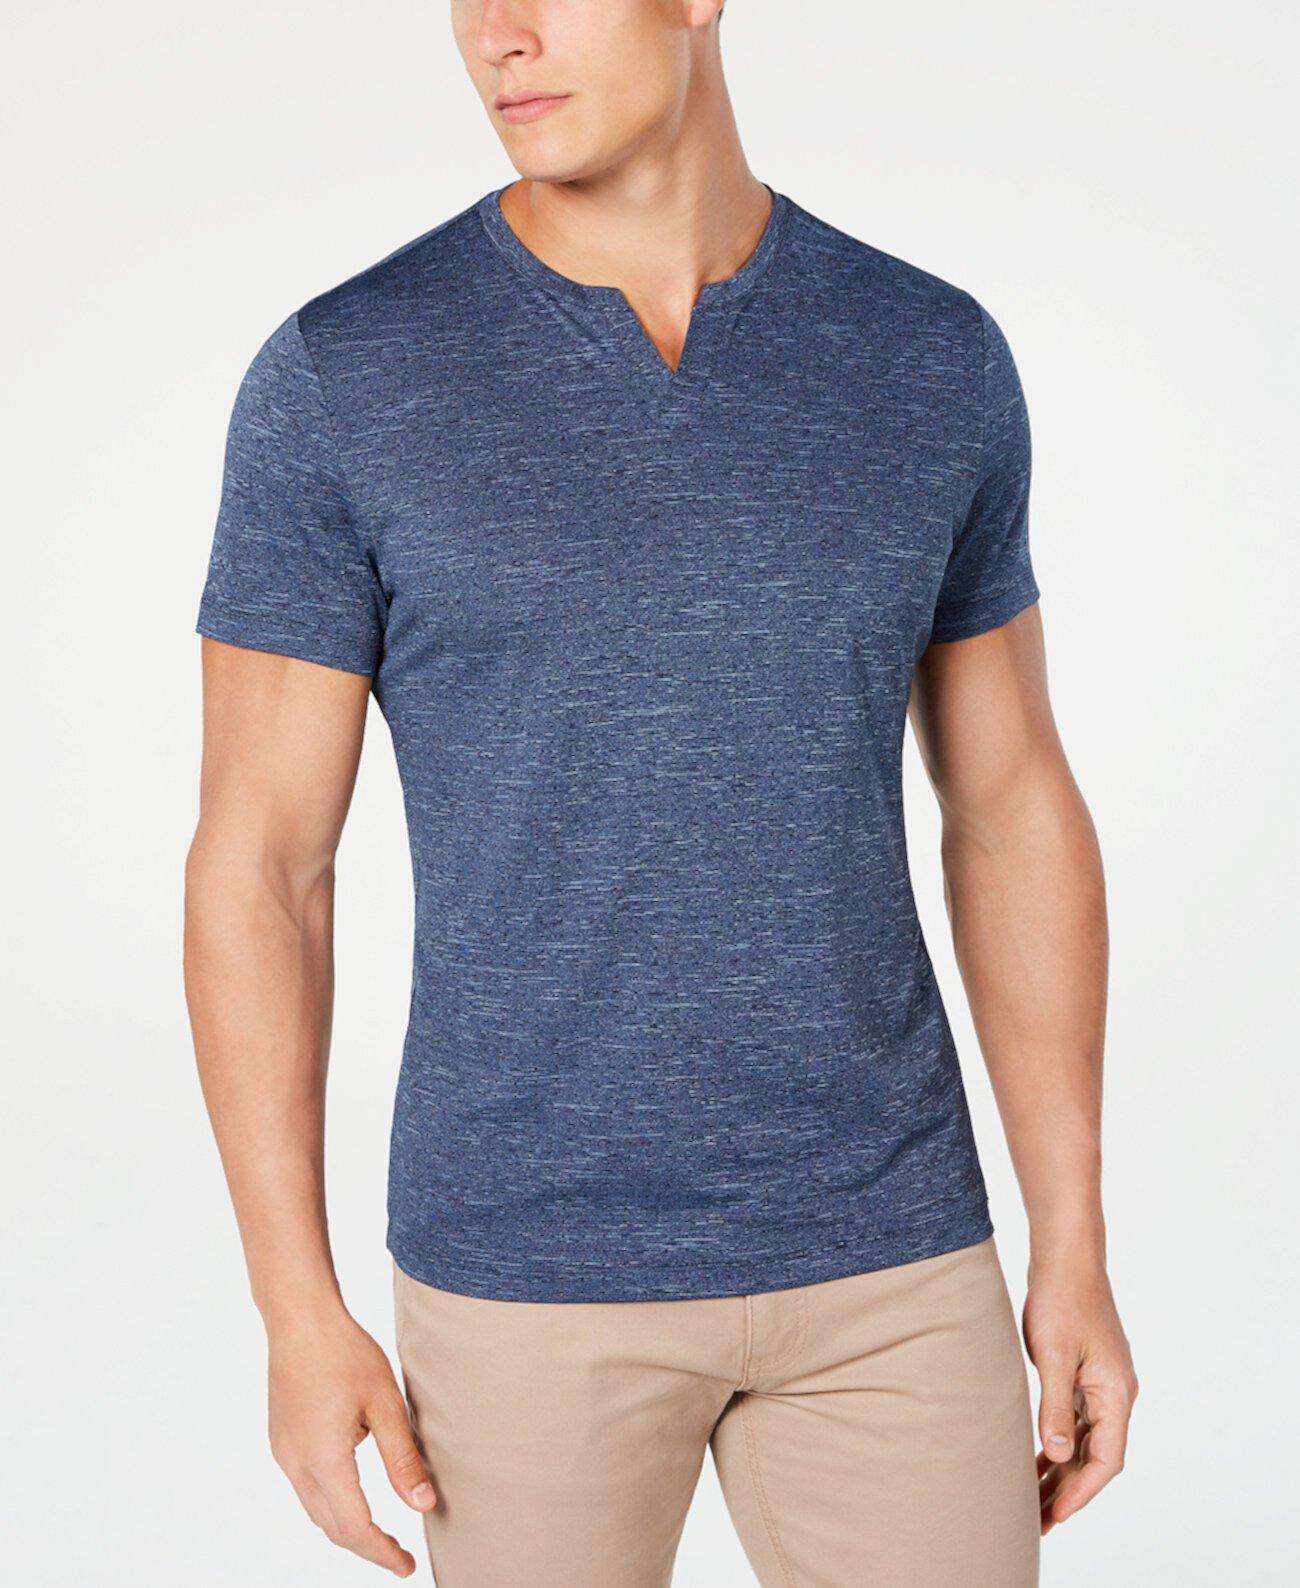 Мужская футболка End of End Dot, созданная для Macy's Alfani